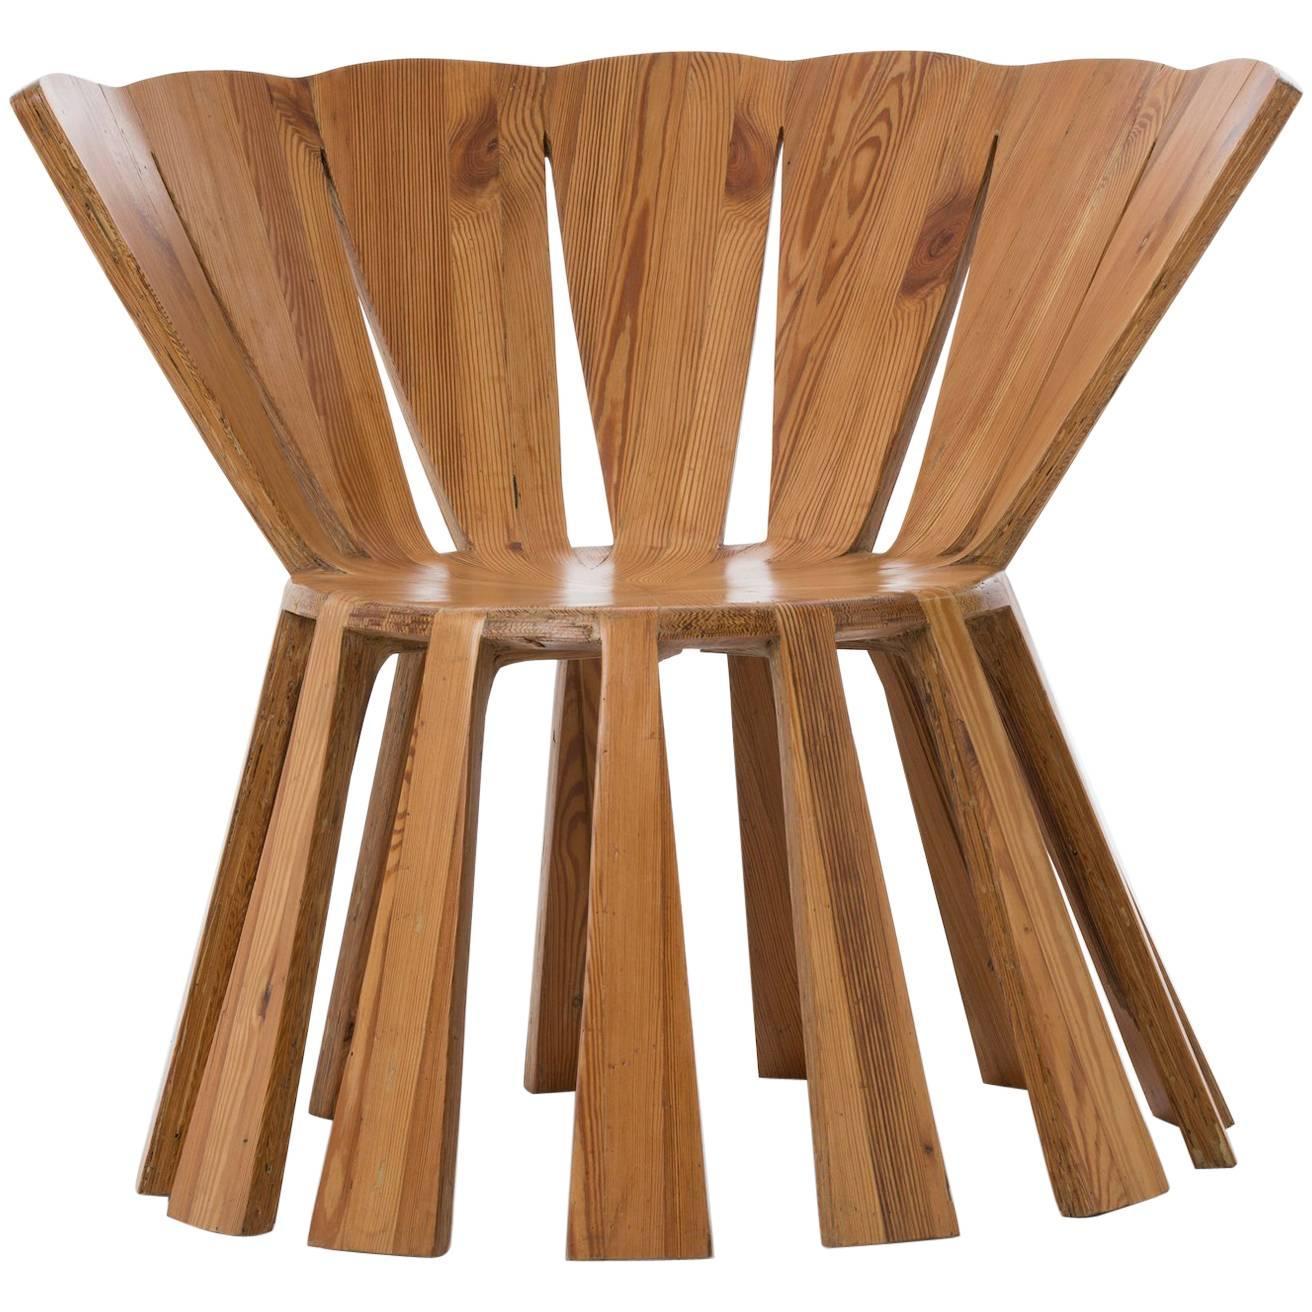 "Contemporary ""Sol"" Chair in Reclaimed Wood by Brazilian Designer Rodrigo Simão"